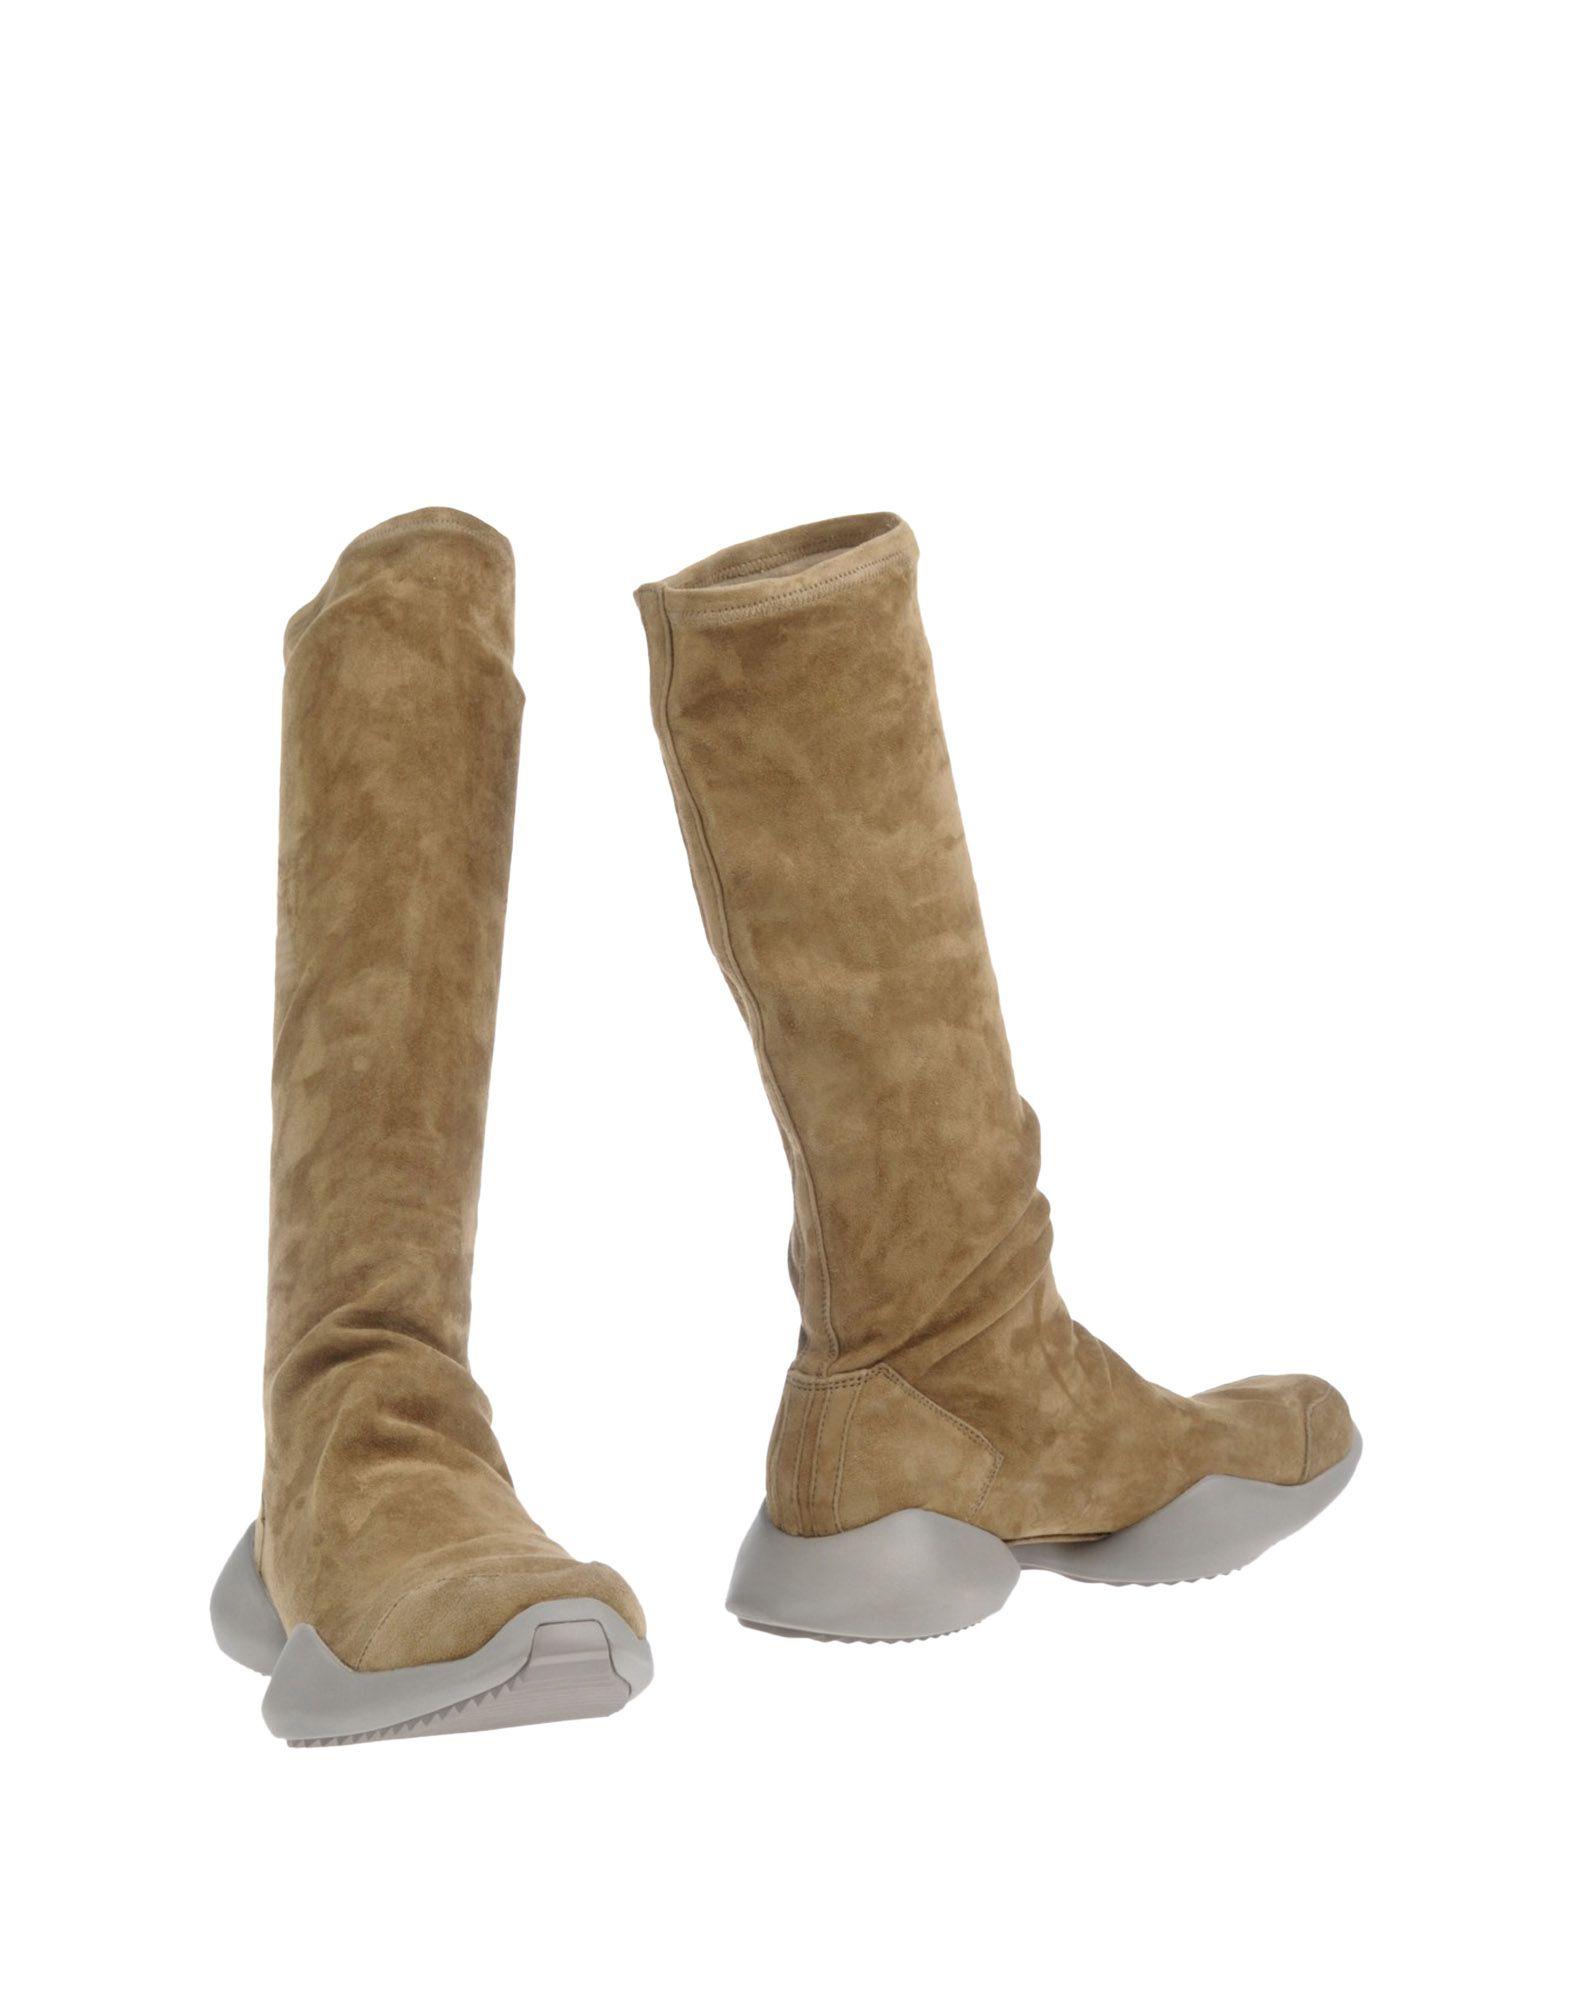 RICK OWENS x ADIDAS Сапоги сапоги adidas сапоги